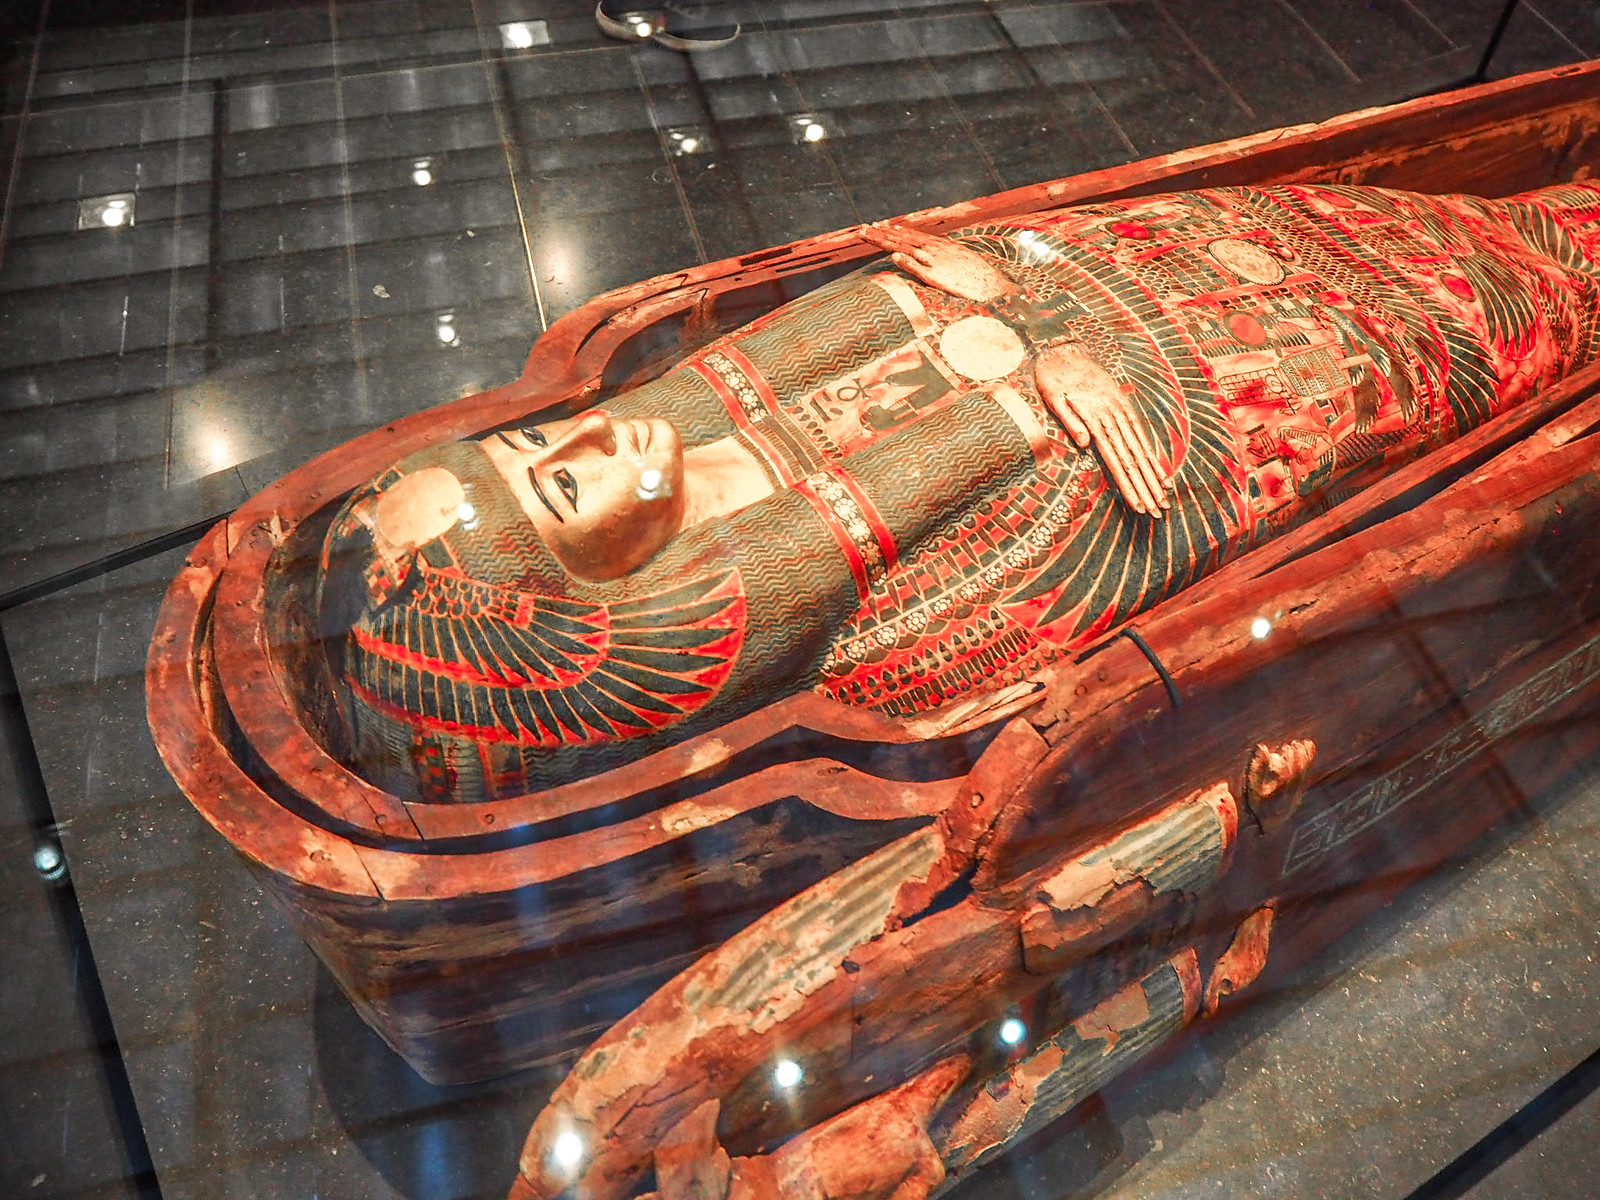 Mummy Louvre Abu Dhabi